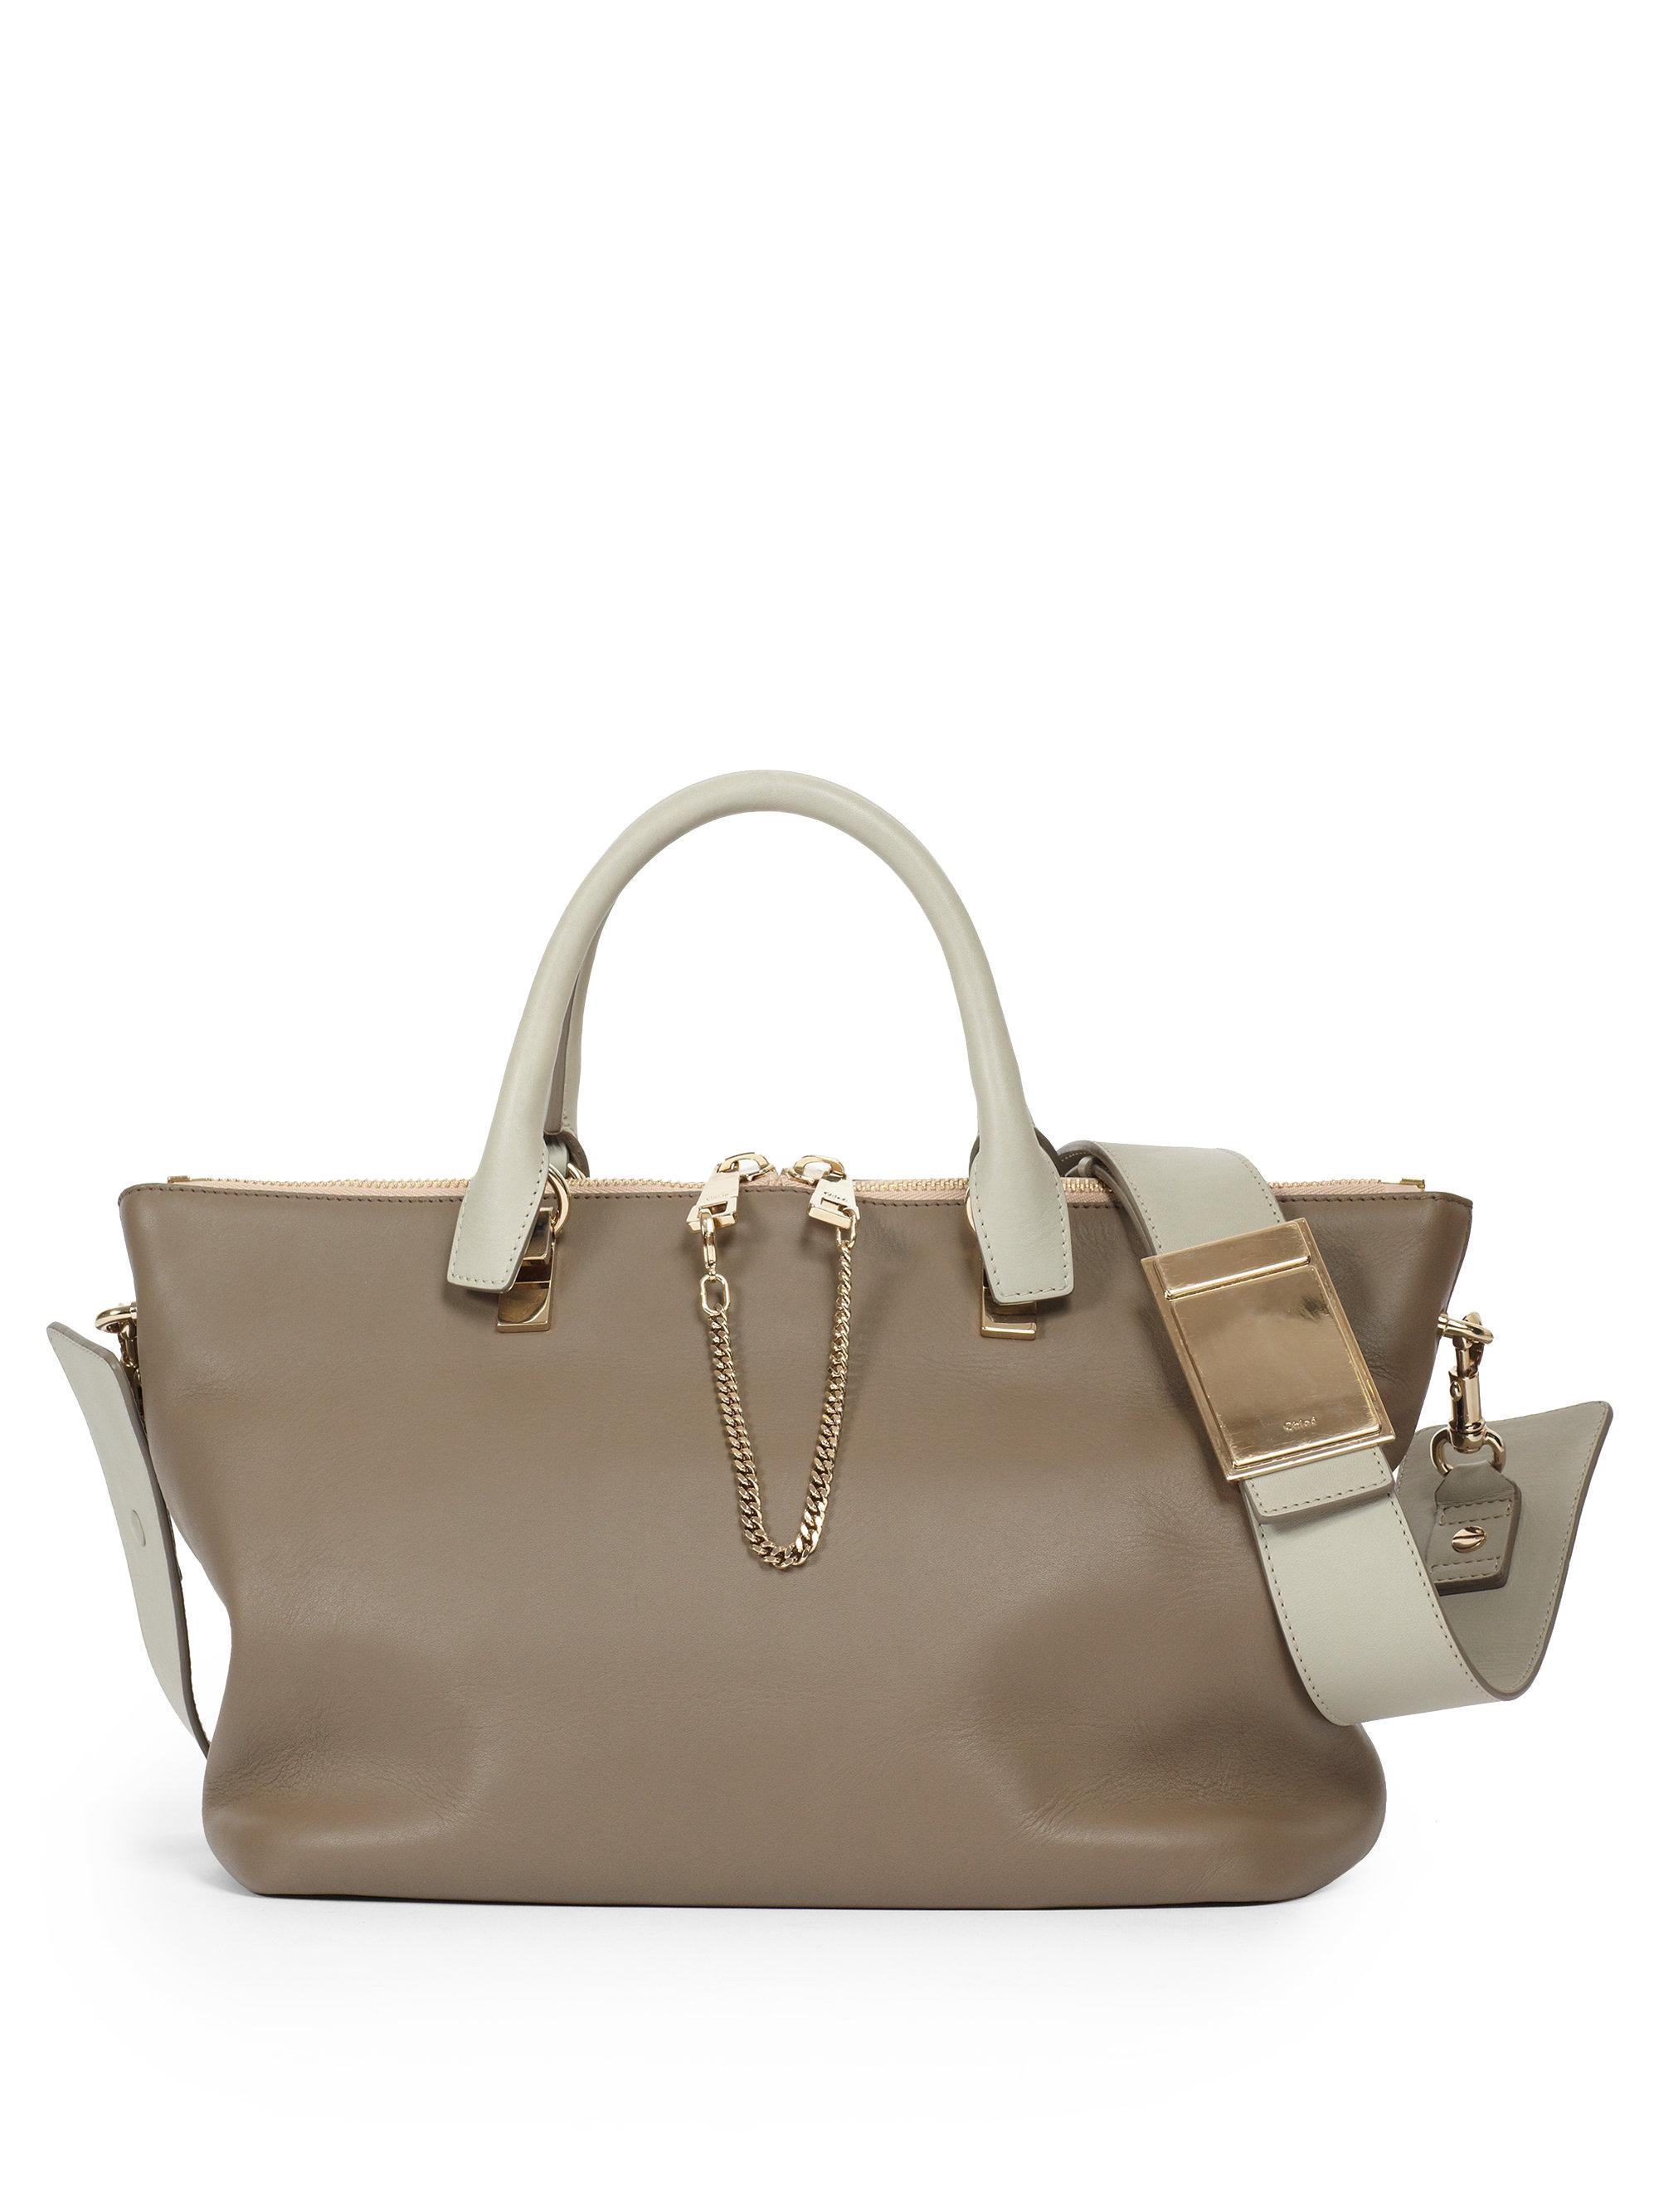 Chlo¨¦ Baylee Medium Shoulder Bag in Gray (PEARL GREY) | Lyst